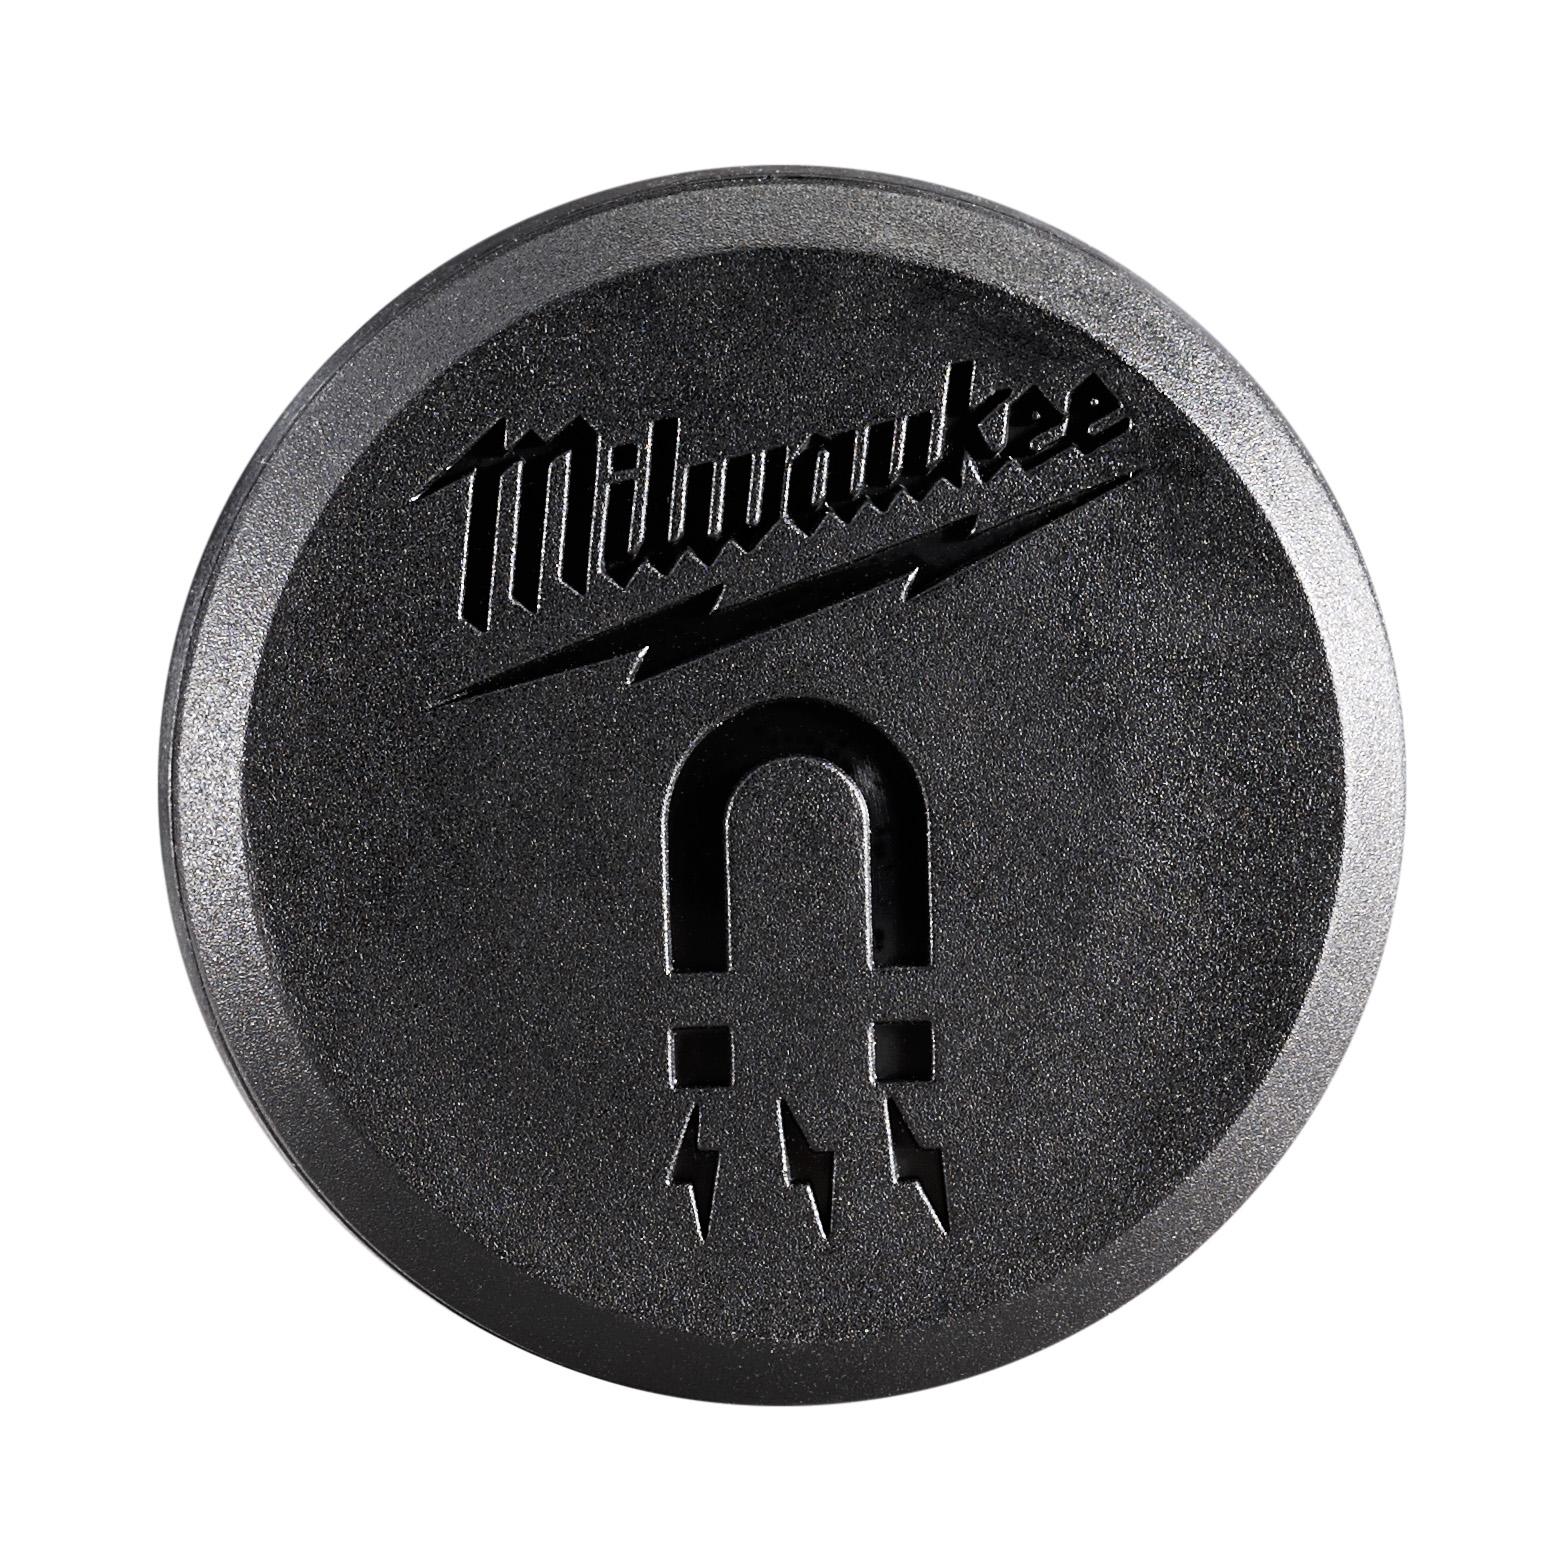 Milwaukee® M12™ 49-24-2351 LED Stick Light Accessory Magnet, For Use With M12™ LED Stick Light, Rare Earth Magnet, Black